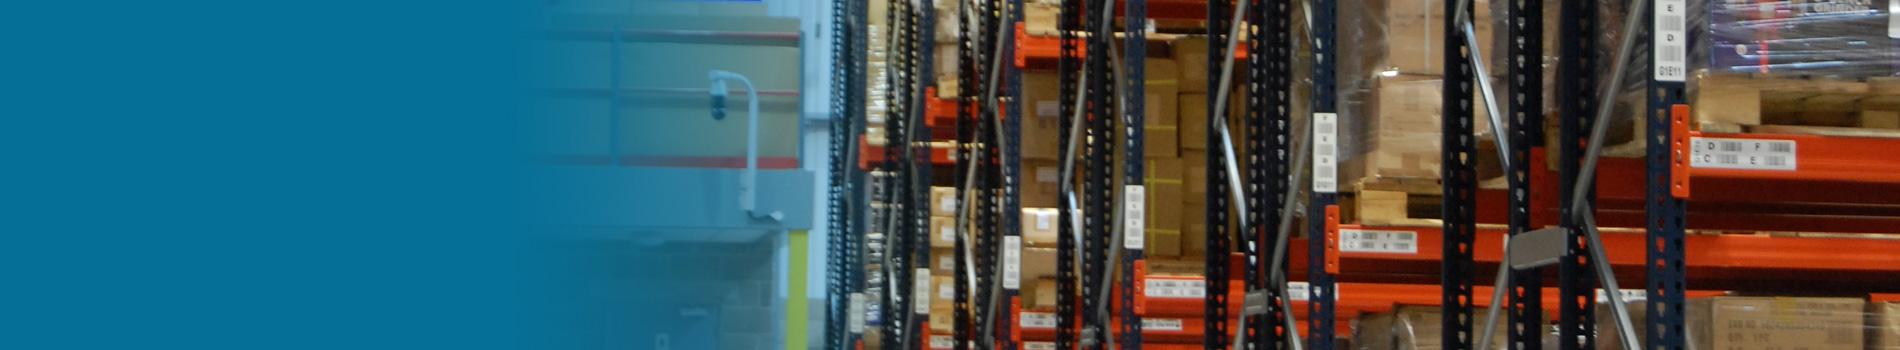 header cabecera almacen warehouse